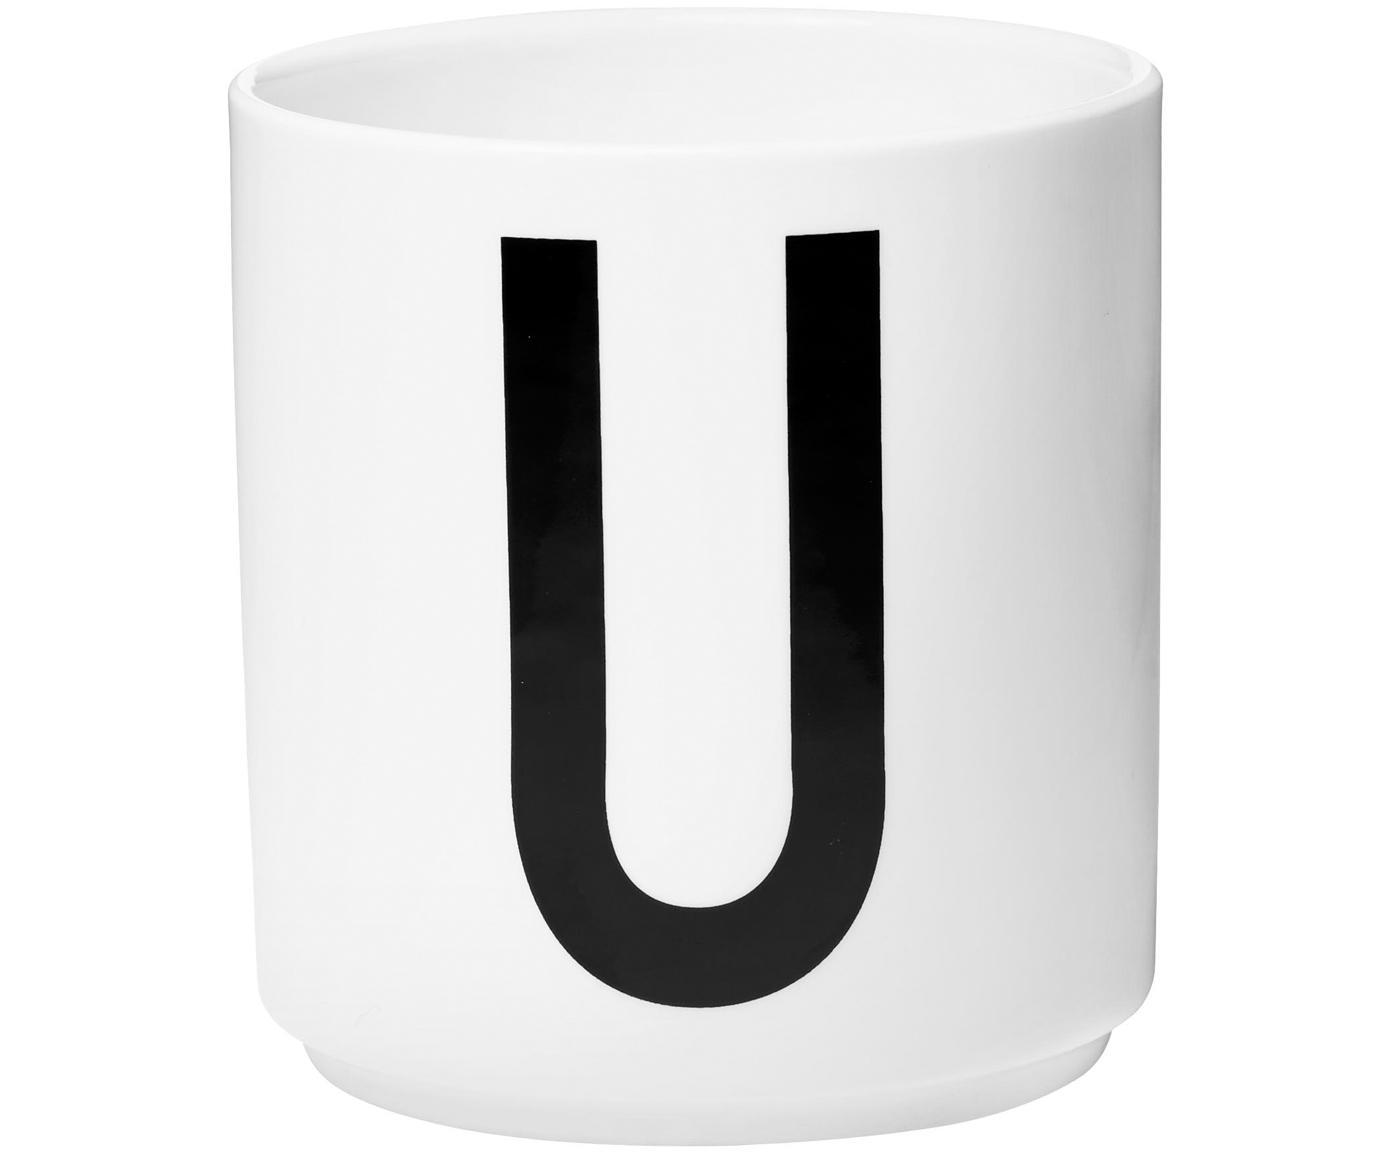 Beker Personal (varianten van A tot Z), Fine Bone China, Wit, zwart, Beker U